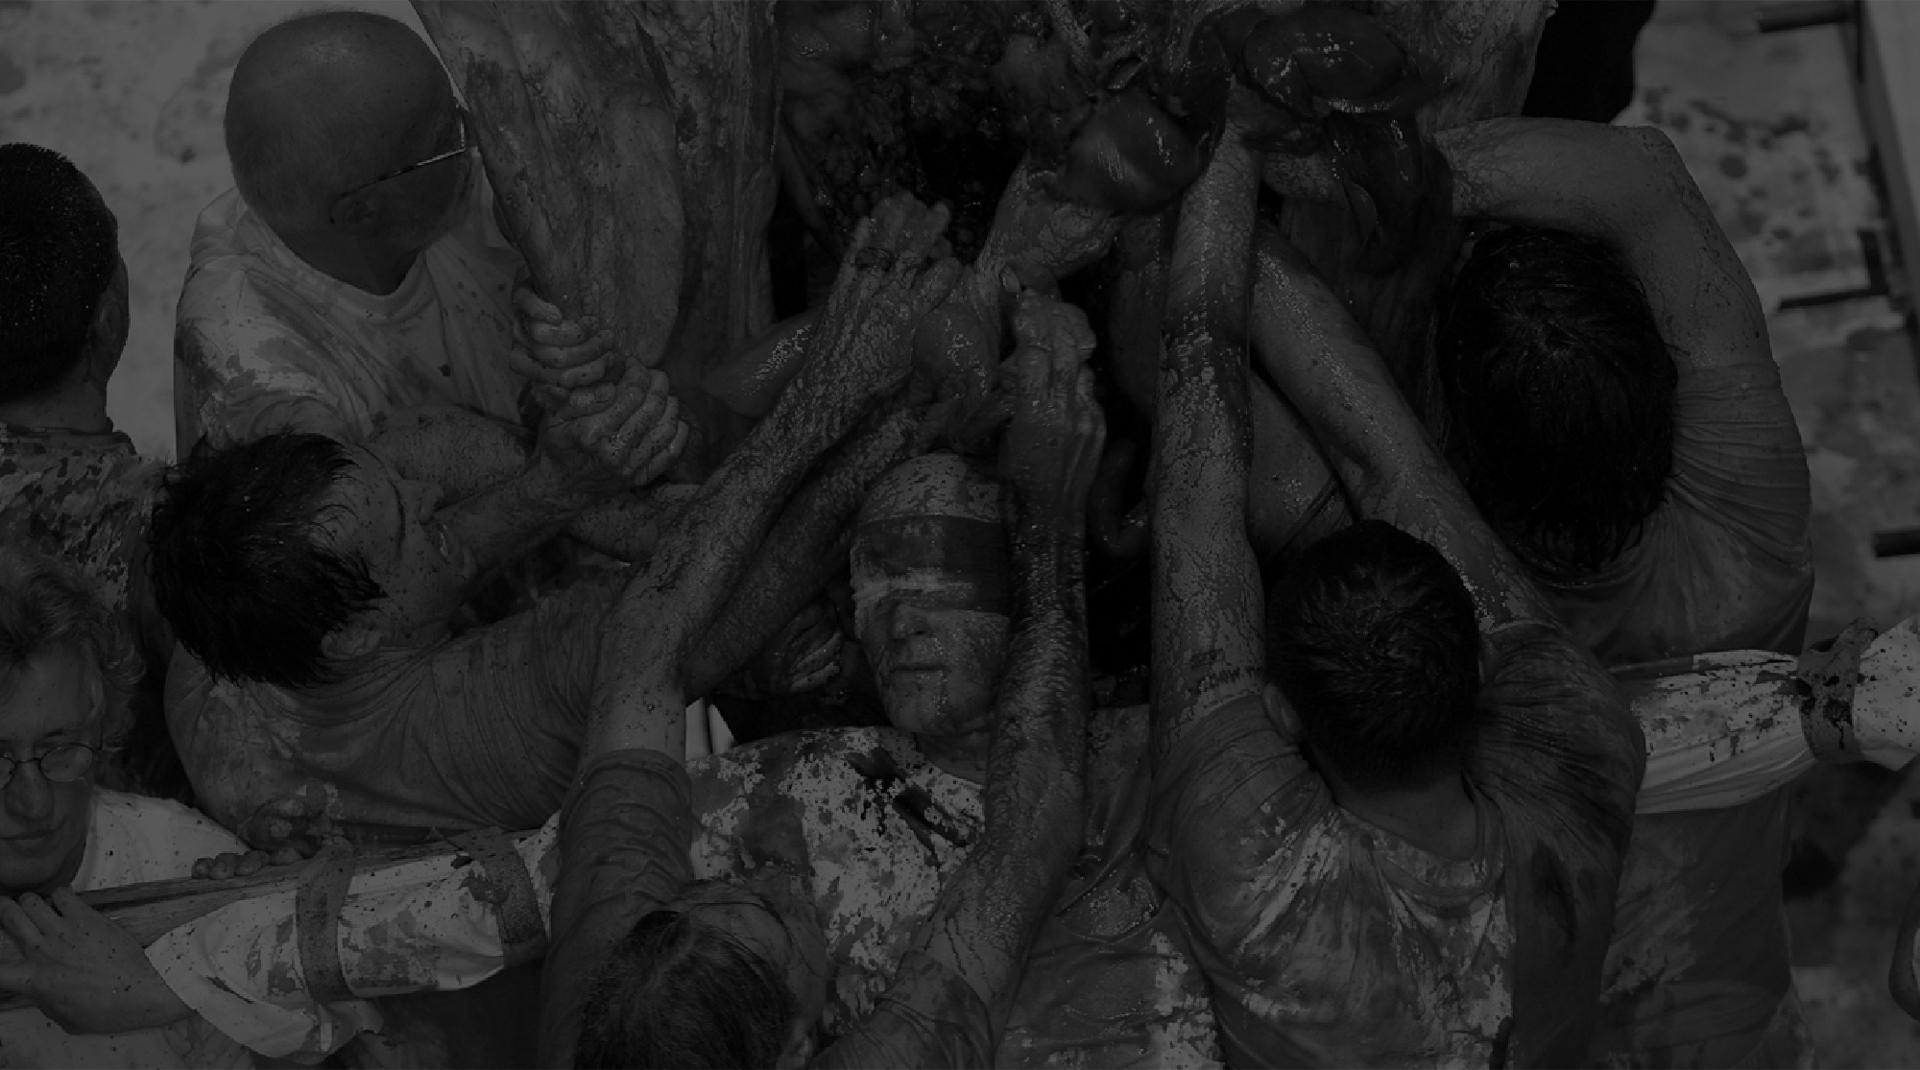 Hermann Nitsch: 150.Action image